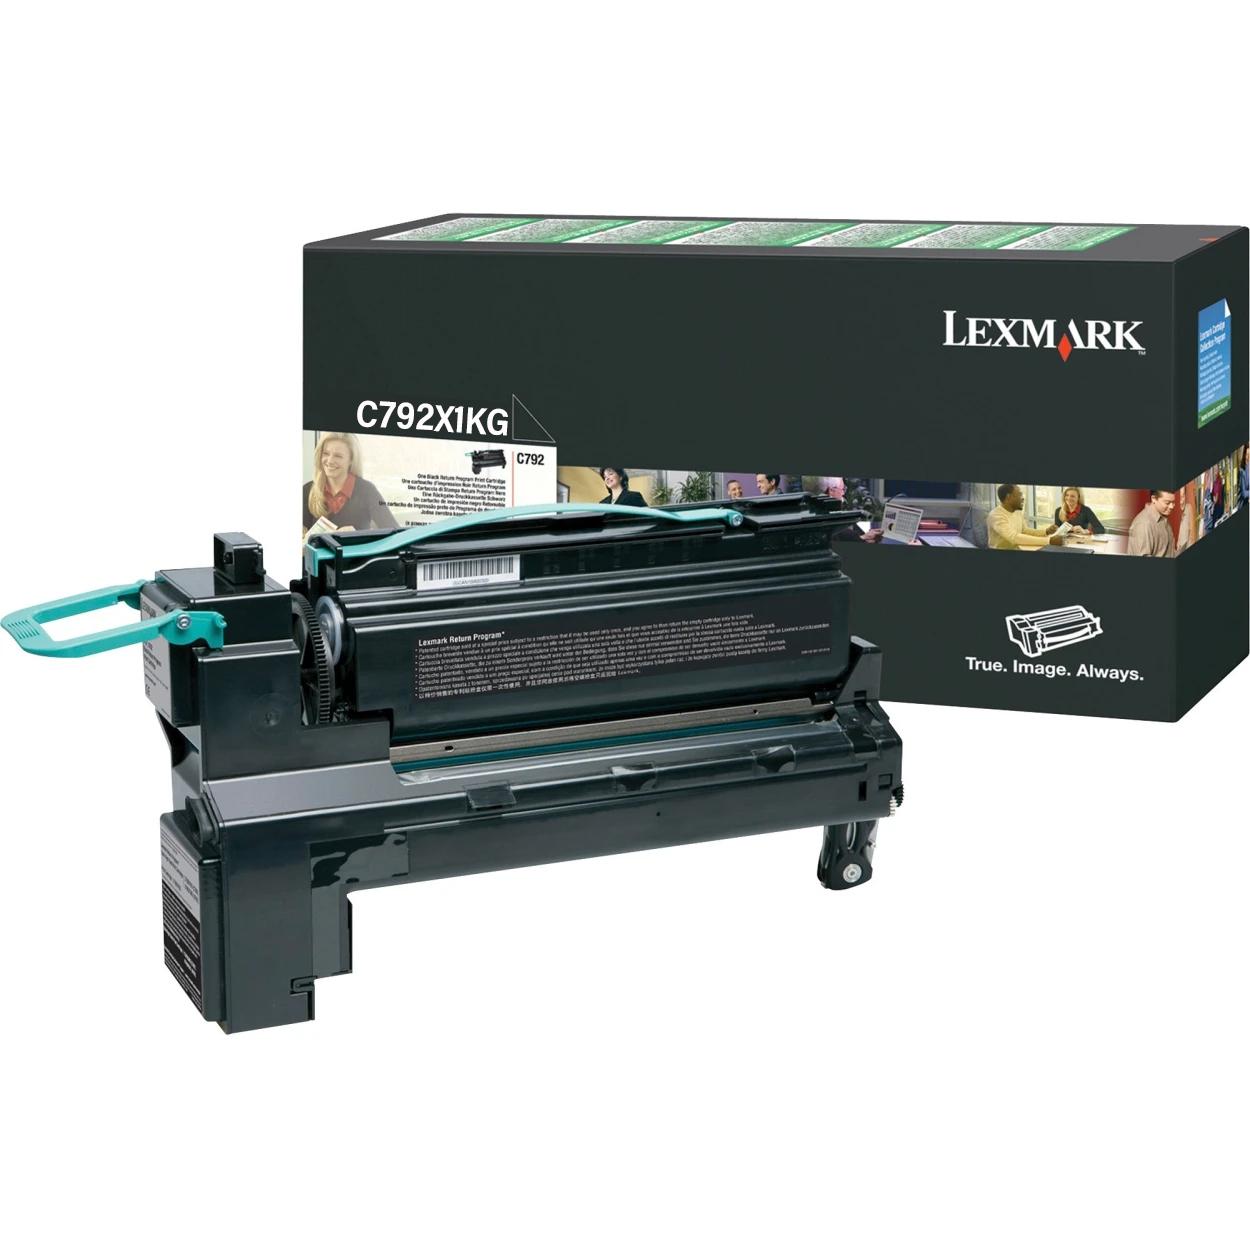 Original Lexmark C792X1KG C792 Black Extra High Yield Toner Cartridge